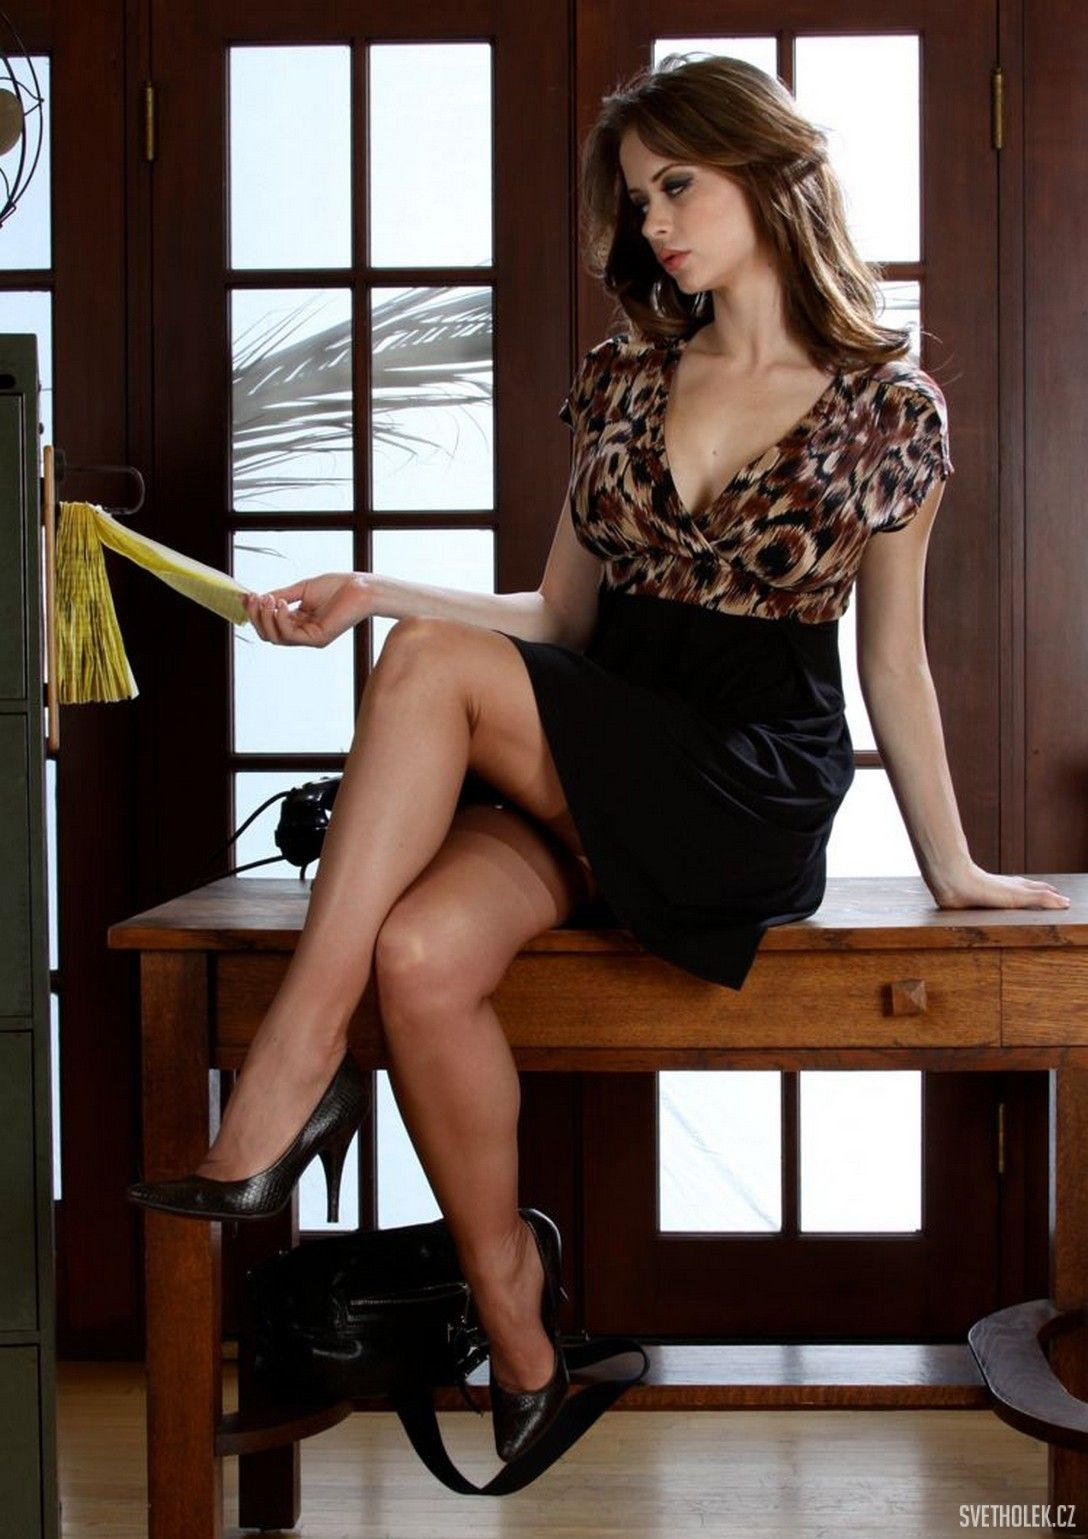 Emily Addison Office Stocking Nylon Legs 32 Hot Girls